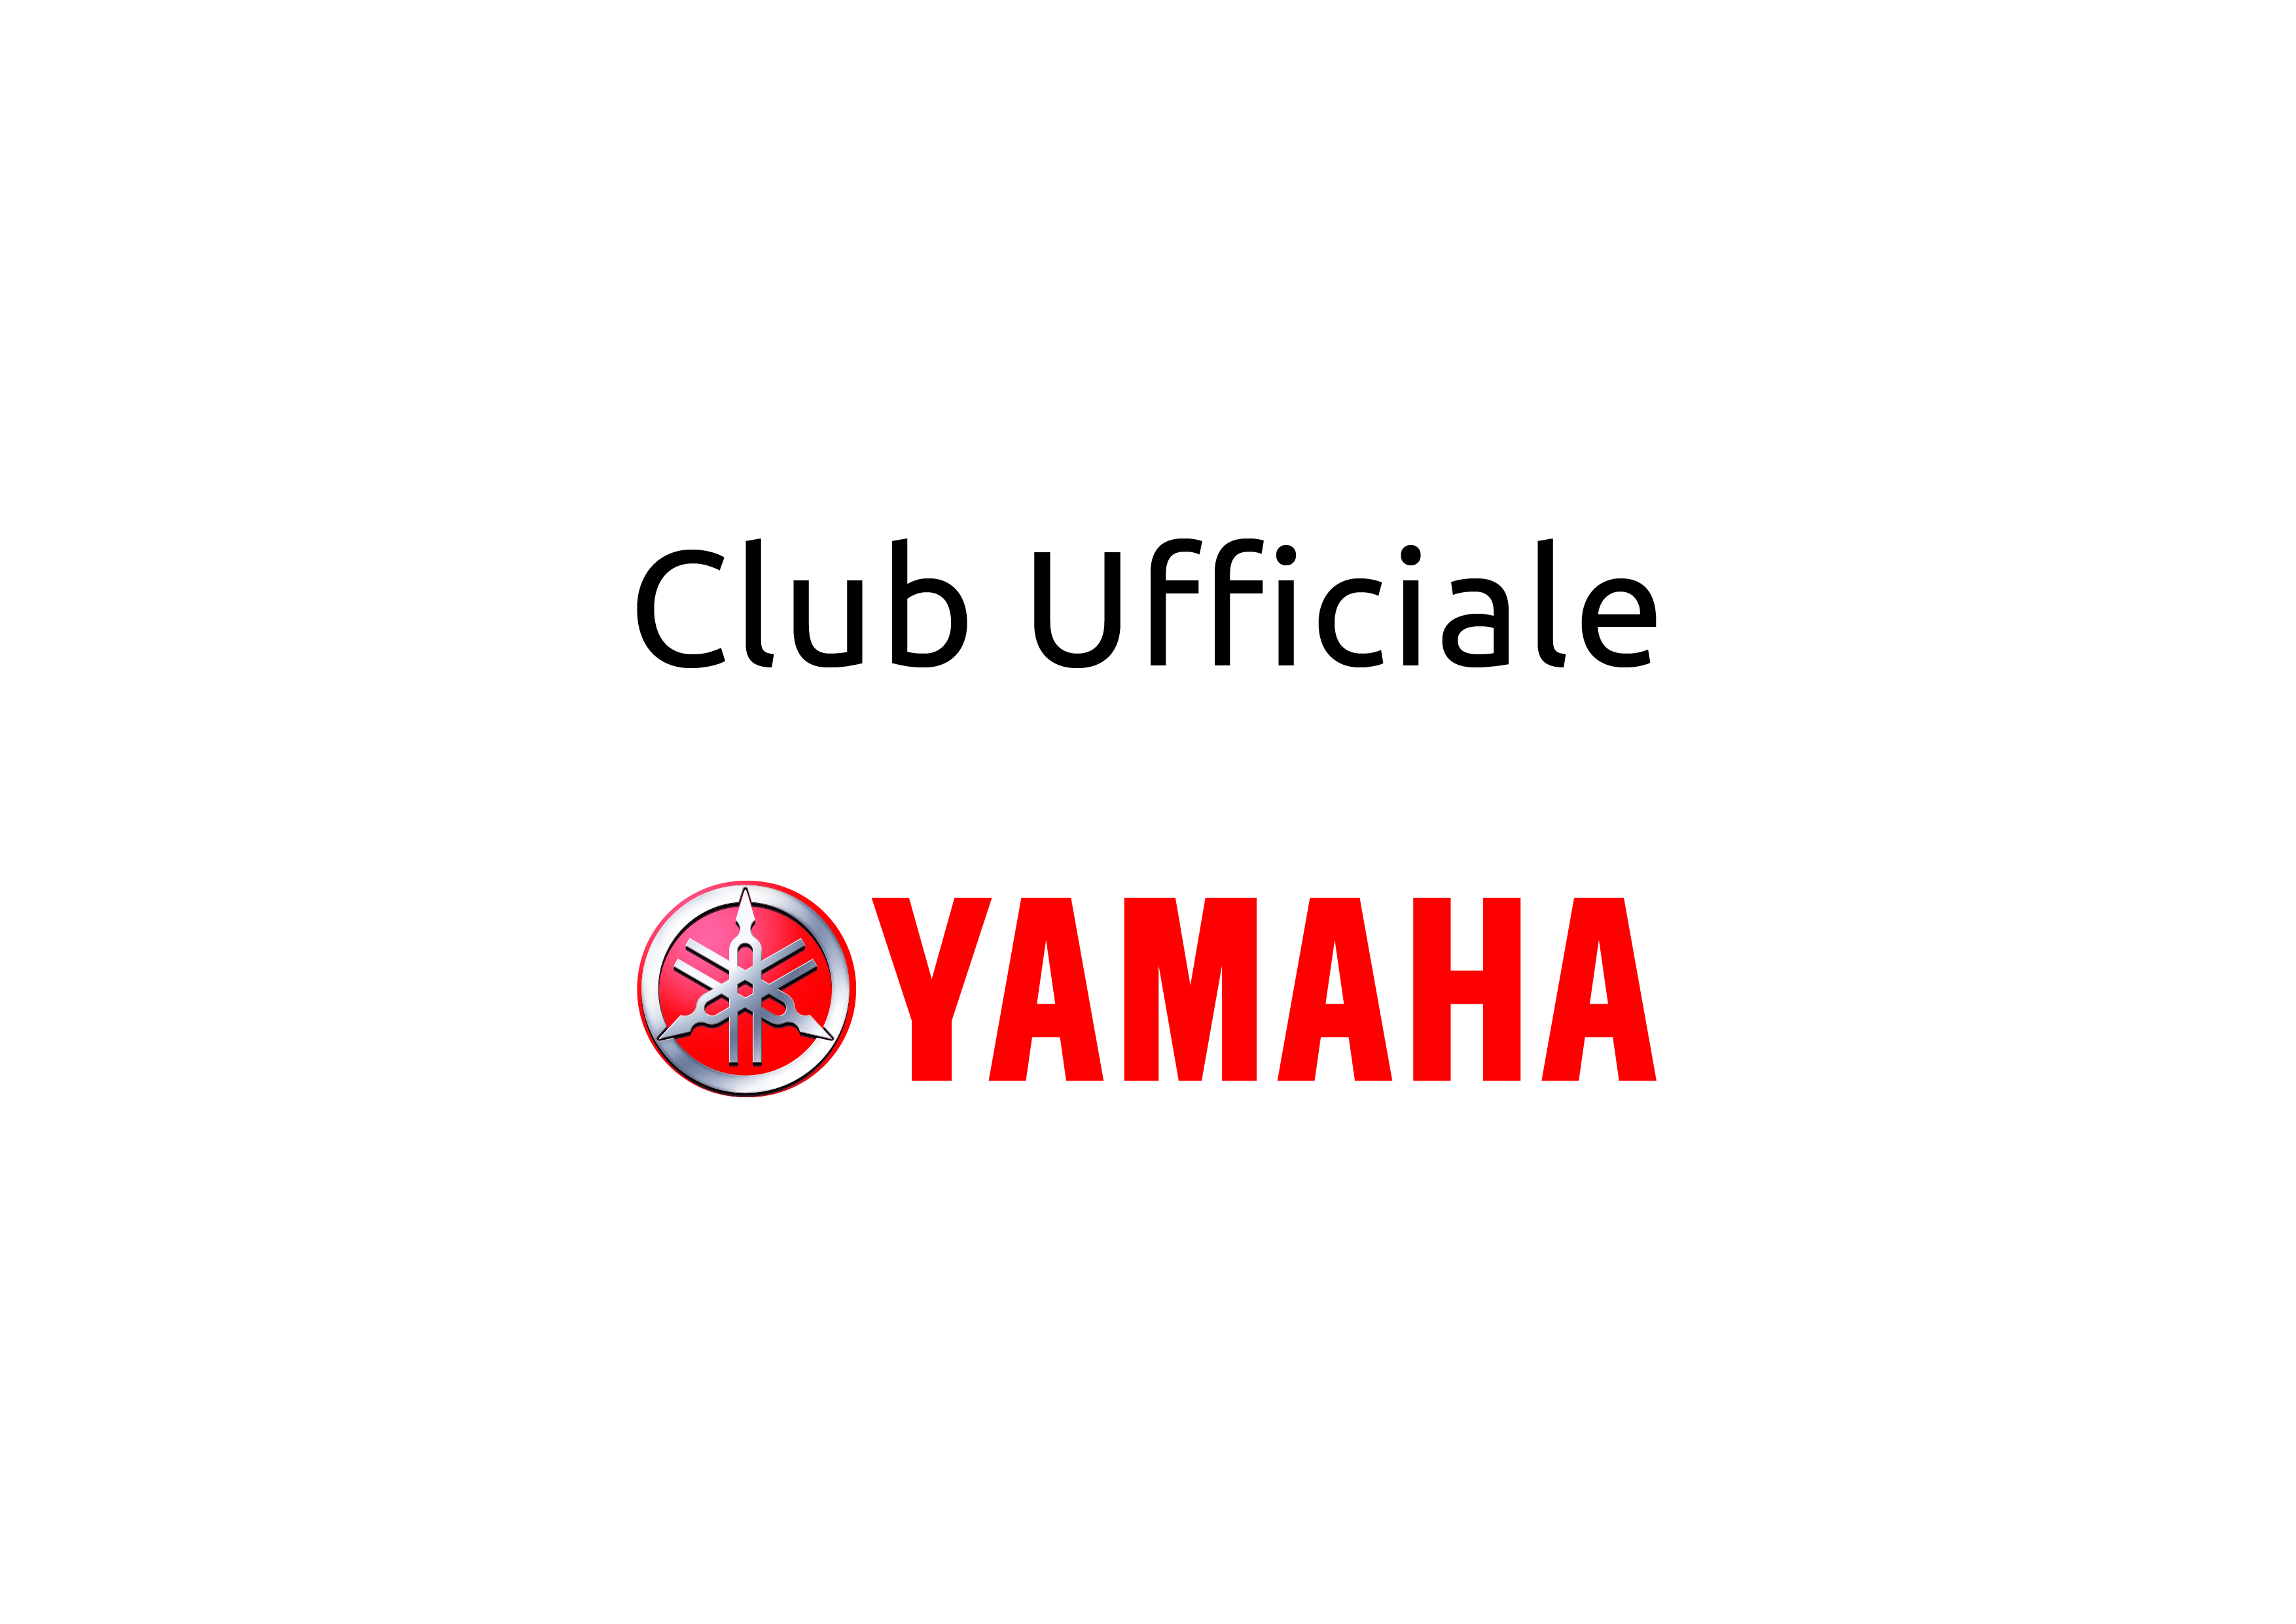 Yamaha Club Ufficiale